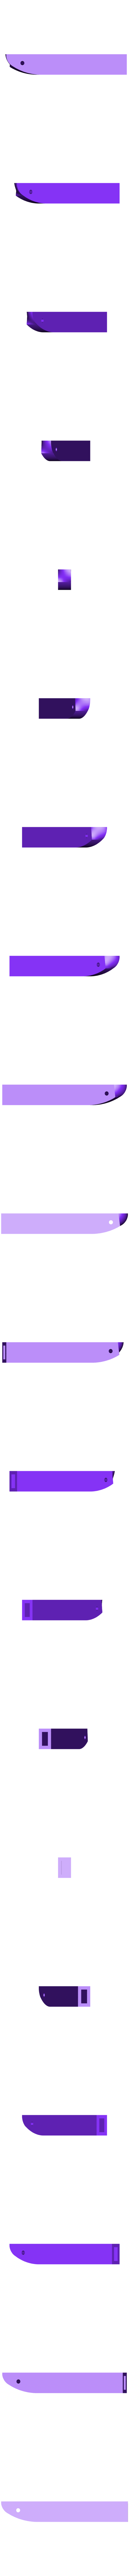 BB_Limb1_1.stl Download free STL file Ballista Bow V1 • 3D printing design, Snorri